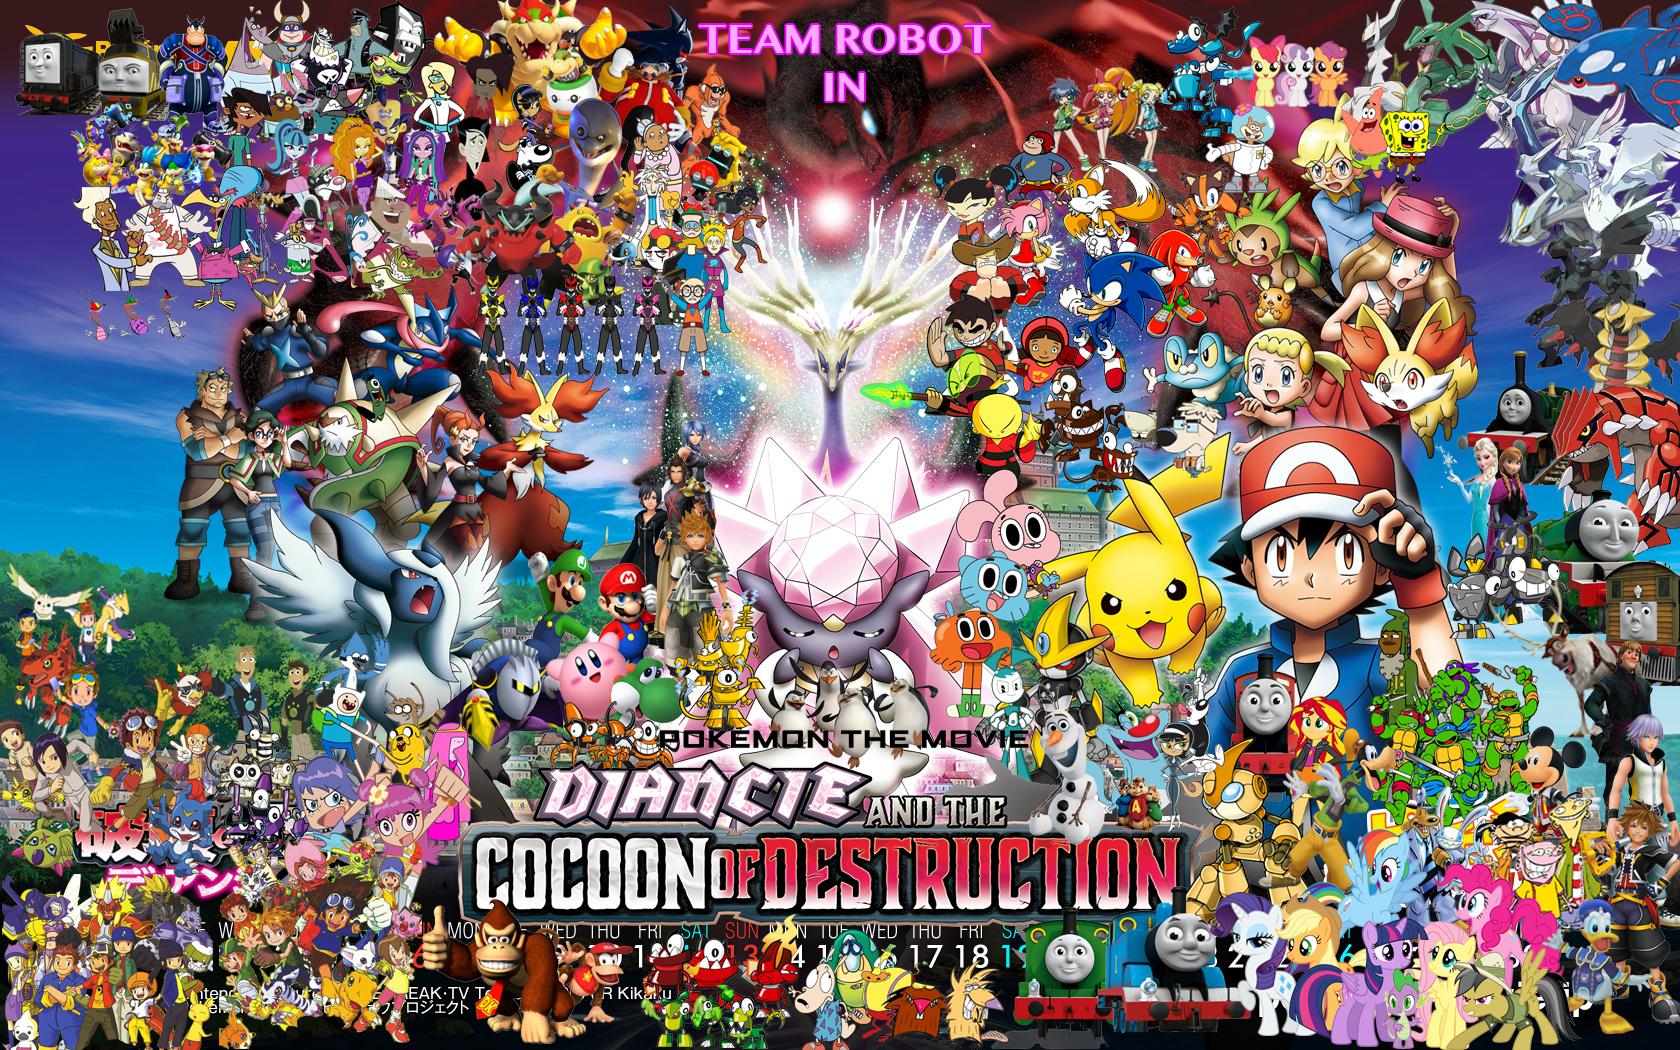 Team Robot in Pokemon: Diancie & The Cocoon of Destruction ...